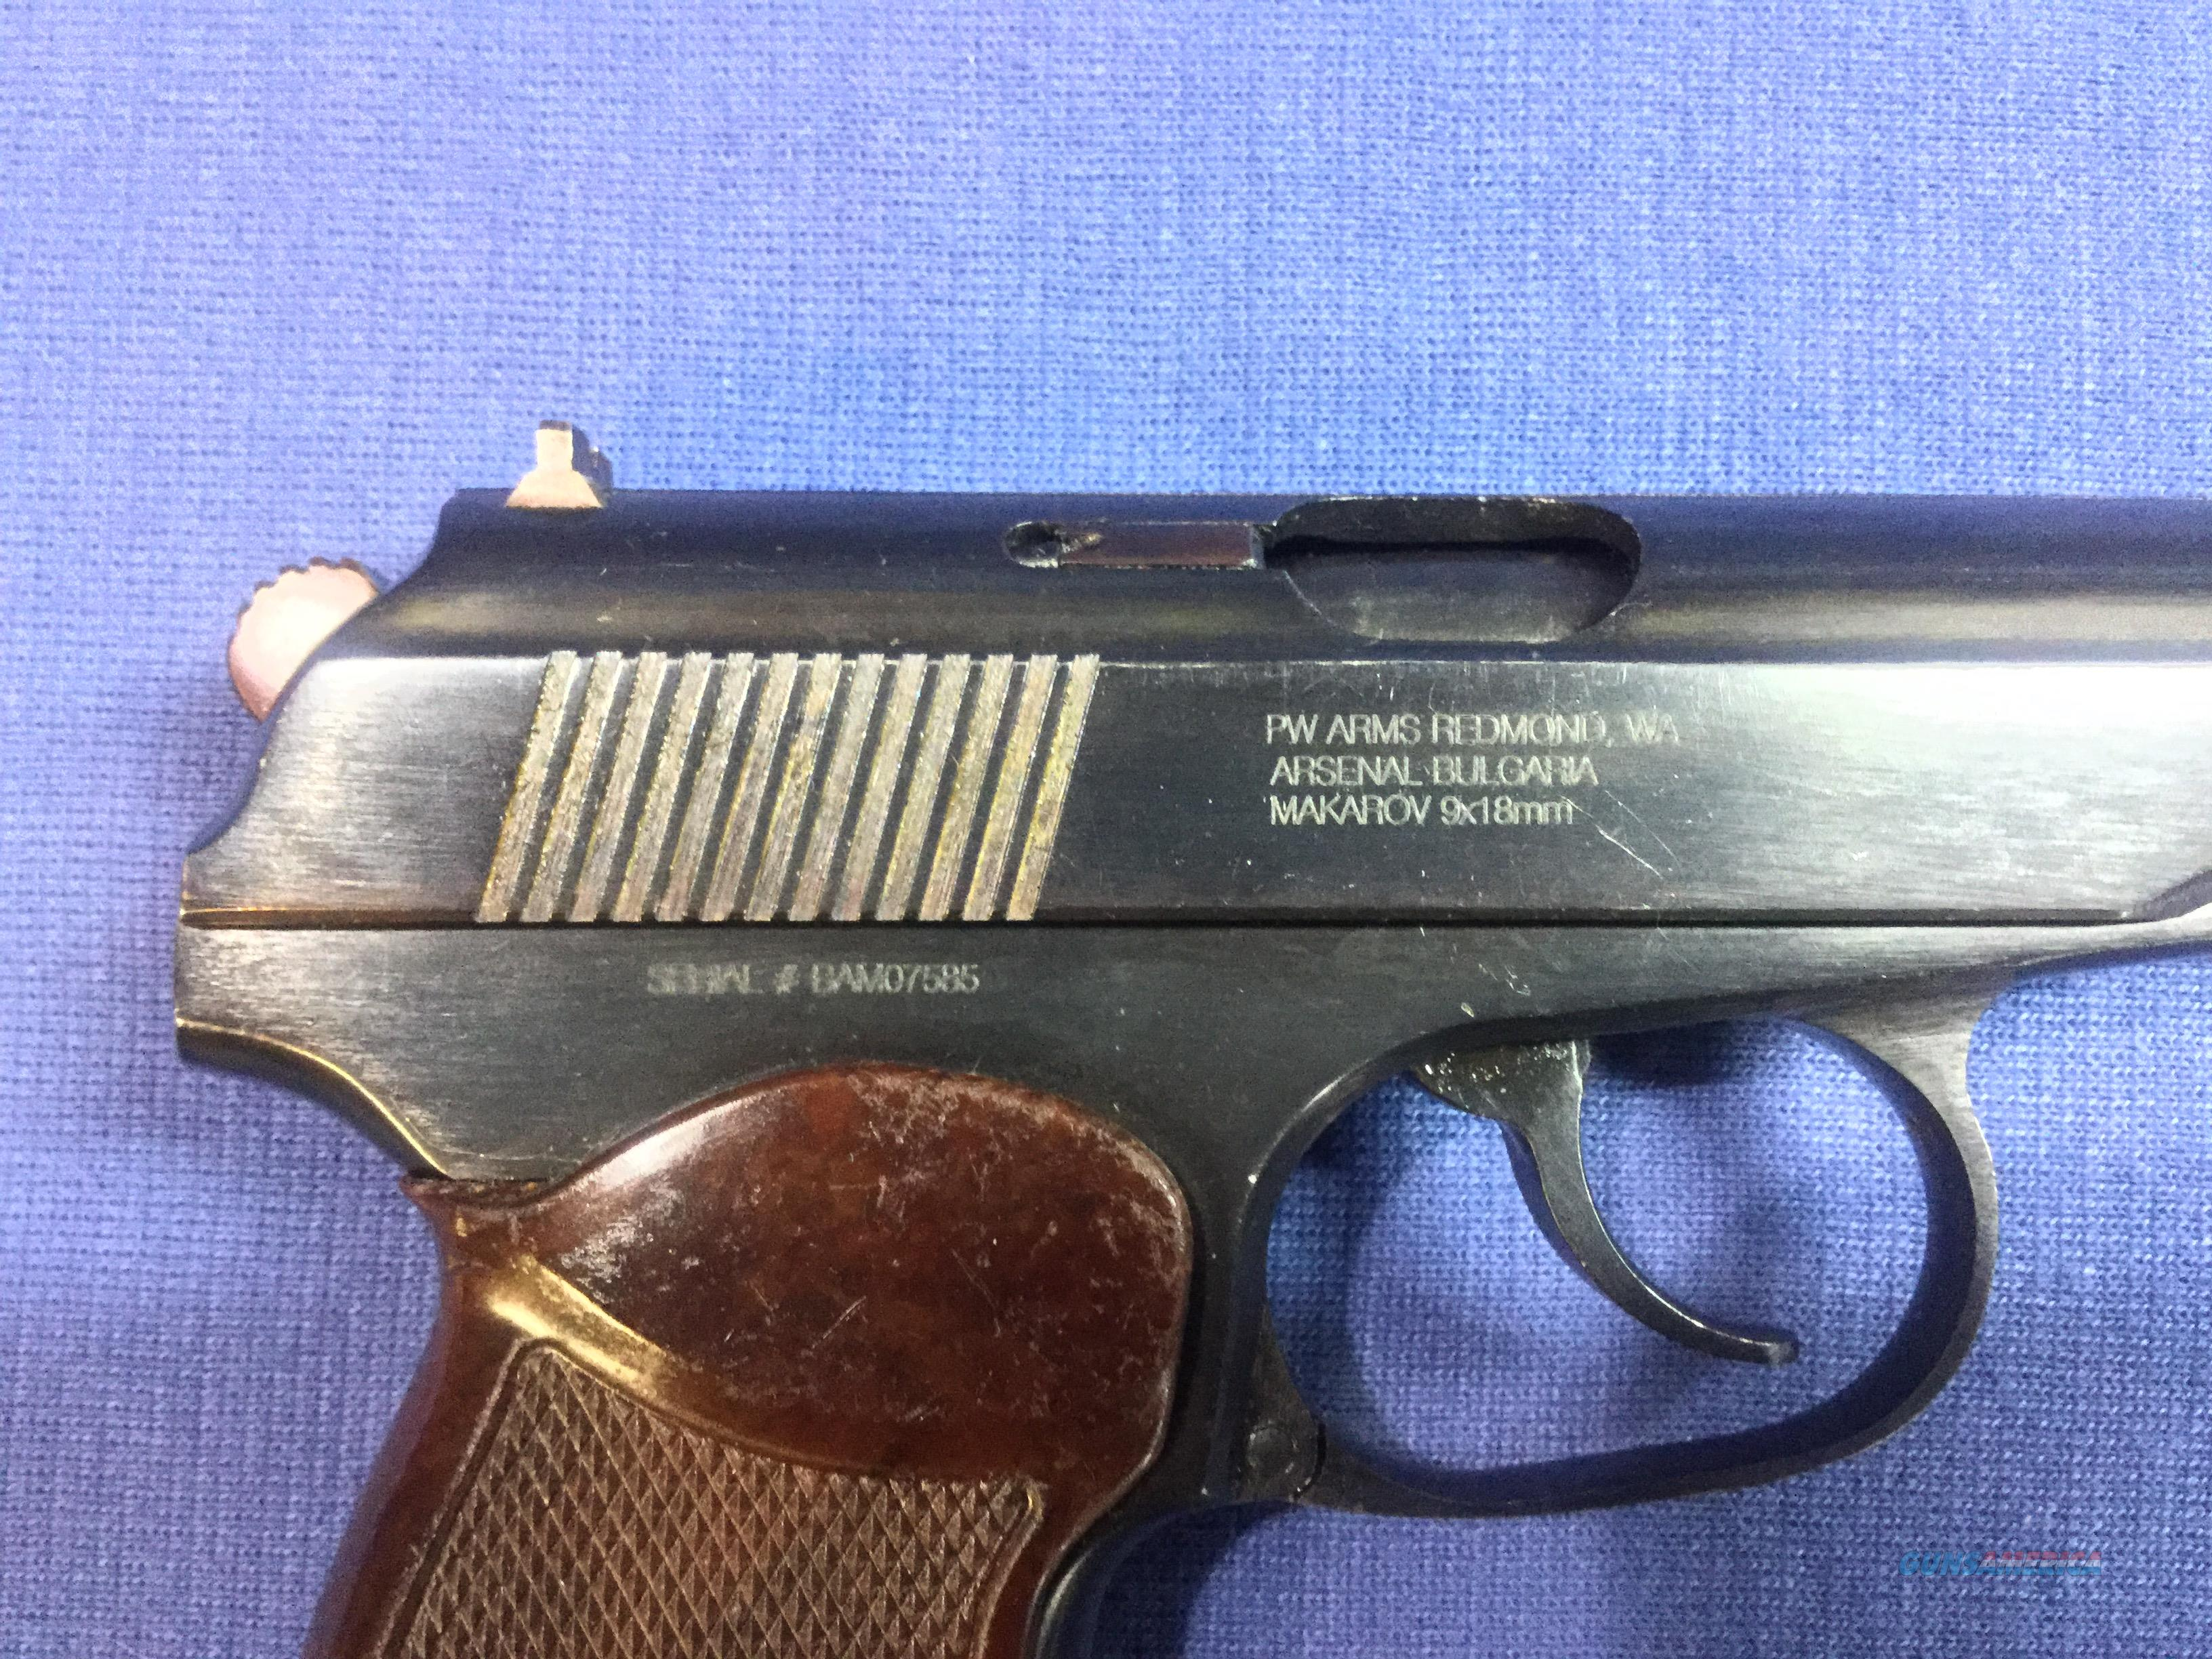 Bulgarian makarov serial numbers myideasbedroom com